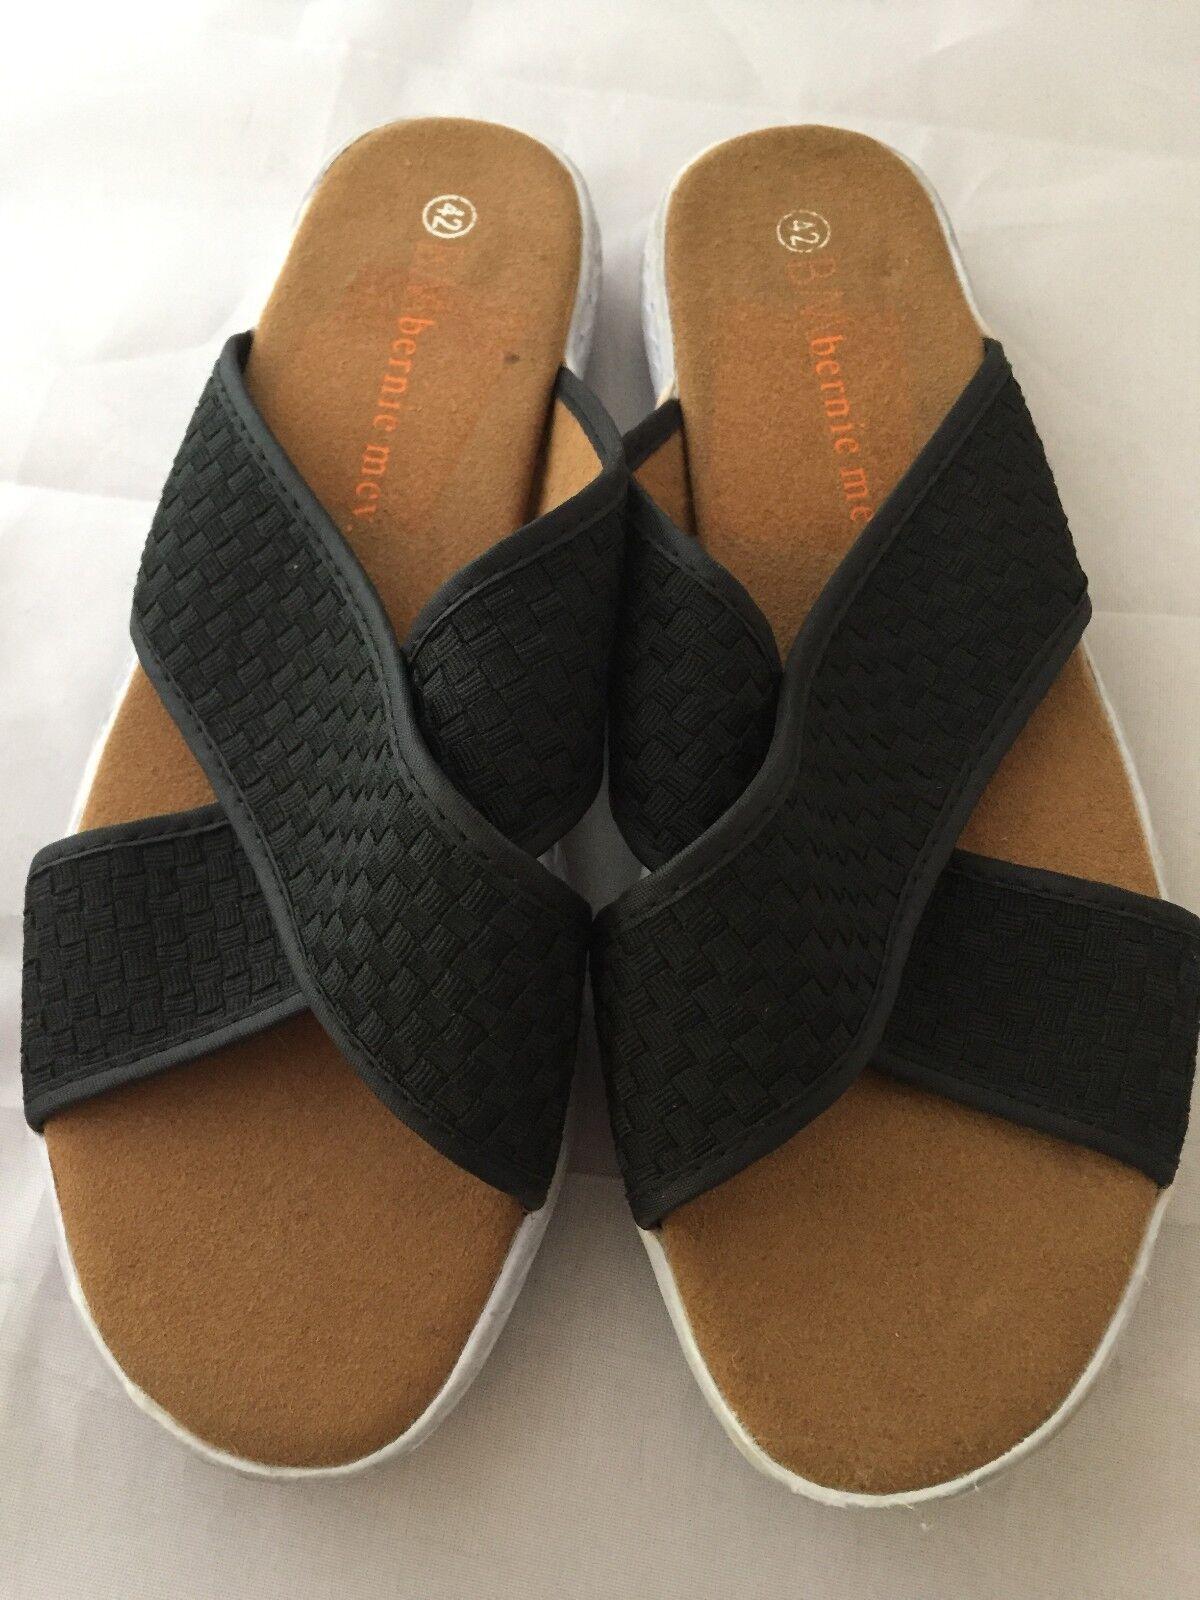 Bernie Women Mev Women's Avon Slide Sandal, Black, Women Bernie Size 42 (11.5-12 US) 618ab1